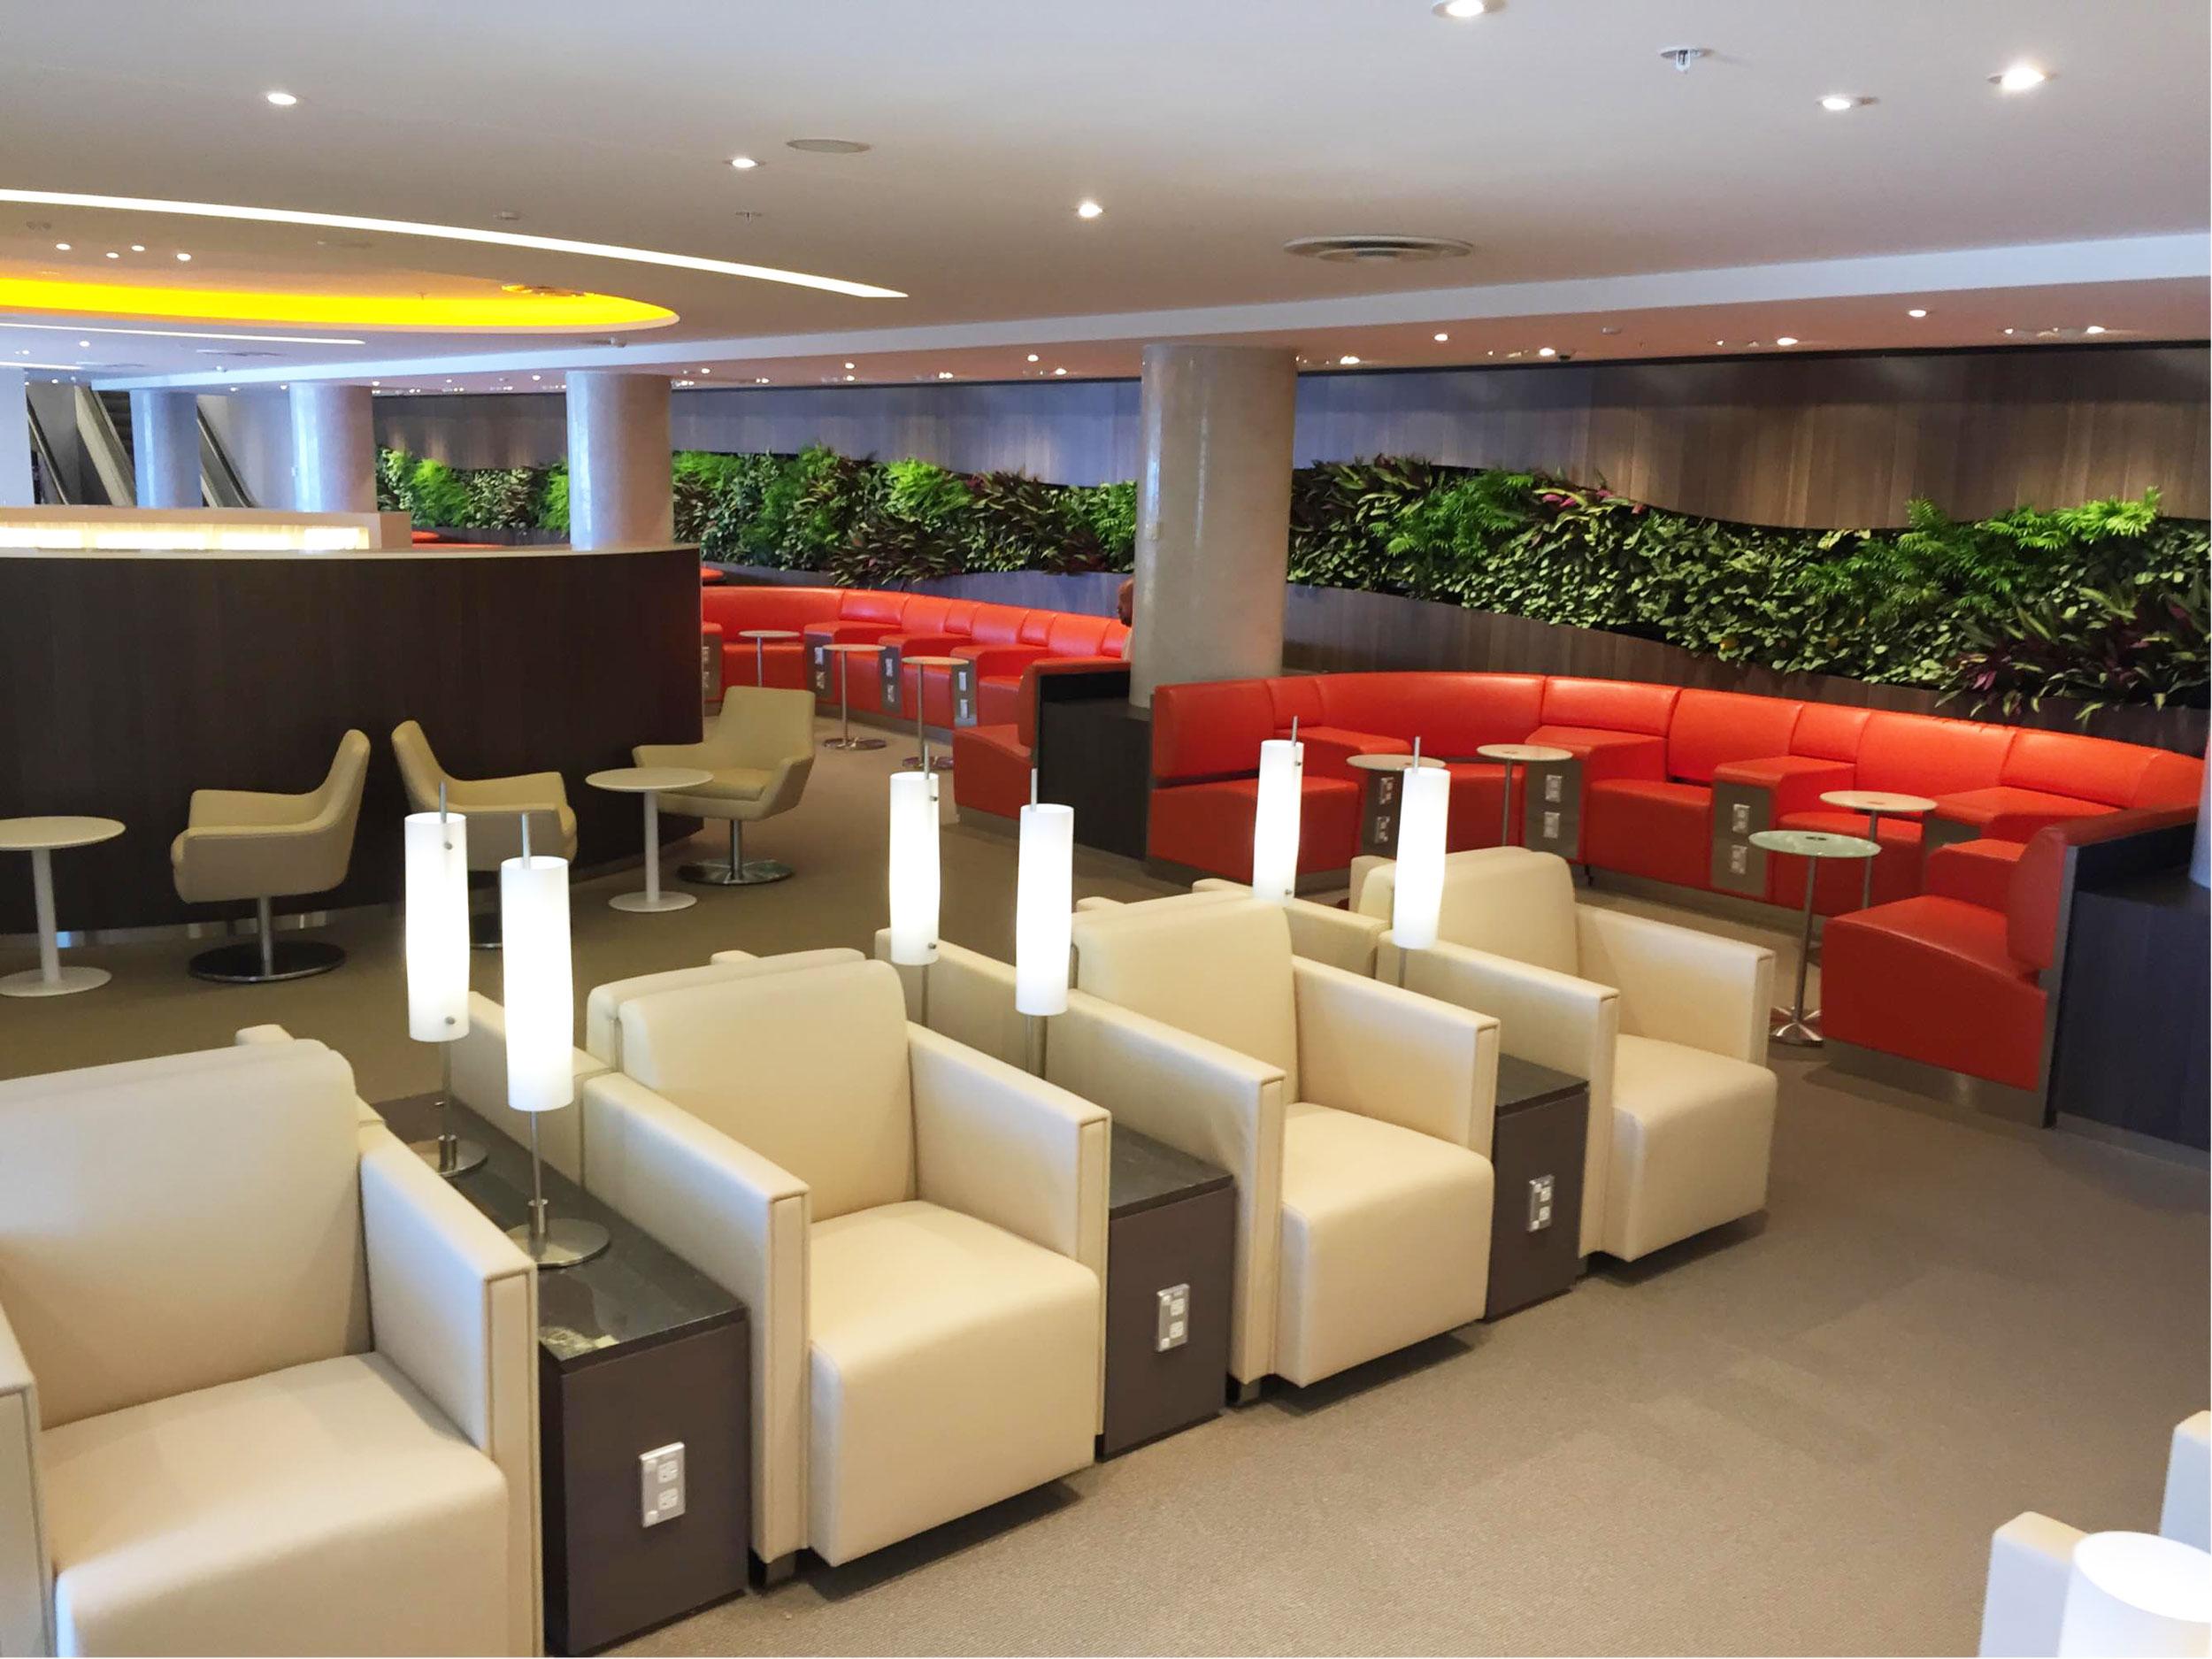 SkyTeam Lounge Sydney: An Inside Look-post-image